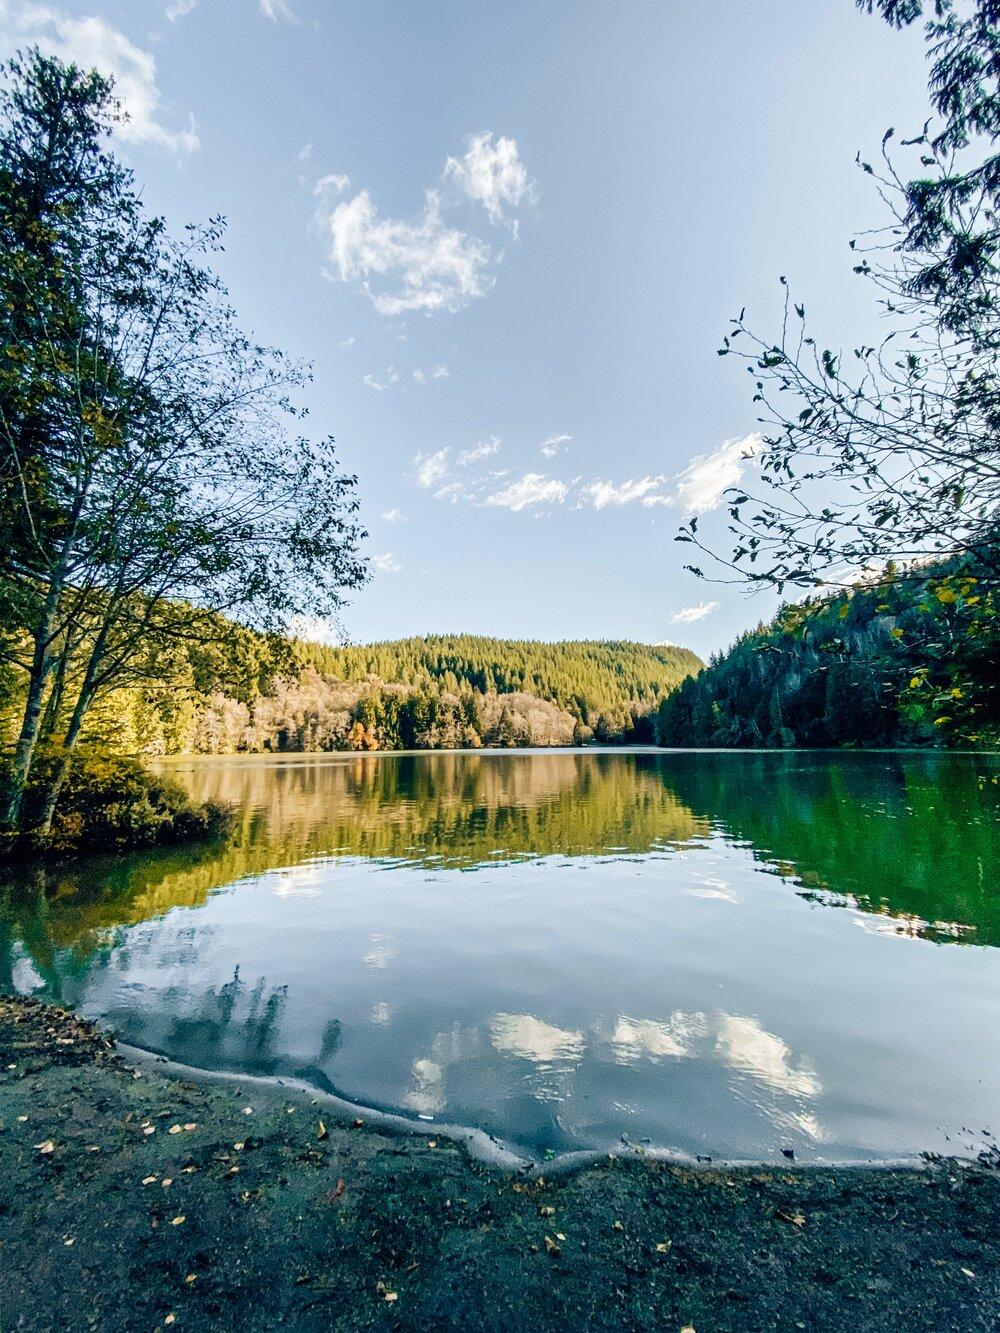 Alice Lake Hike in Squamish British Columbia